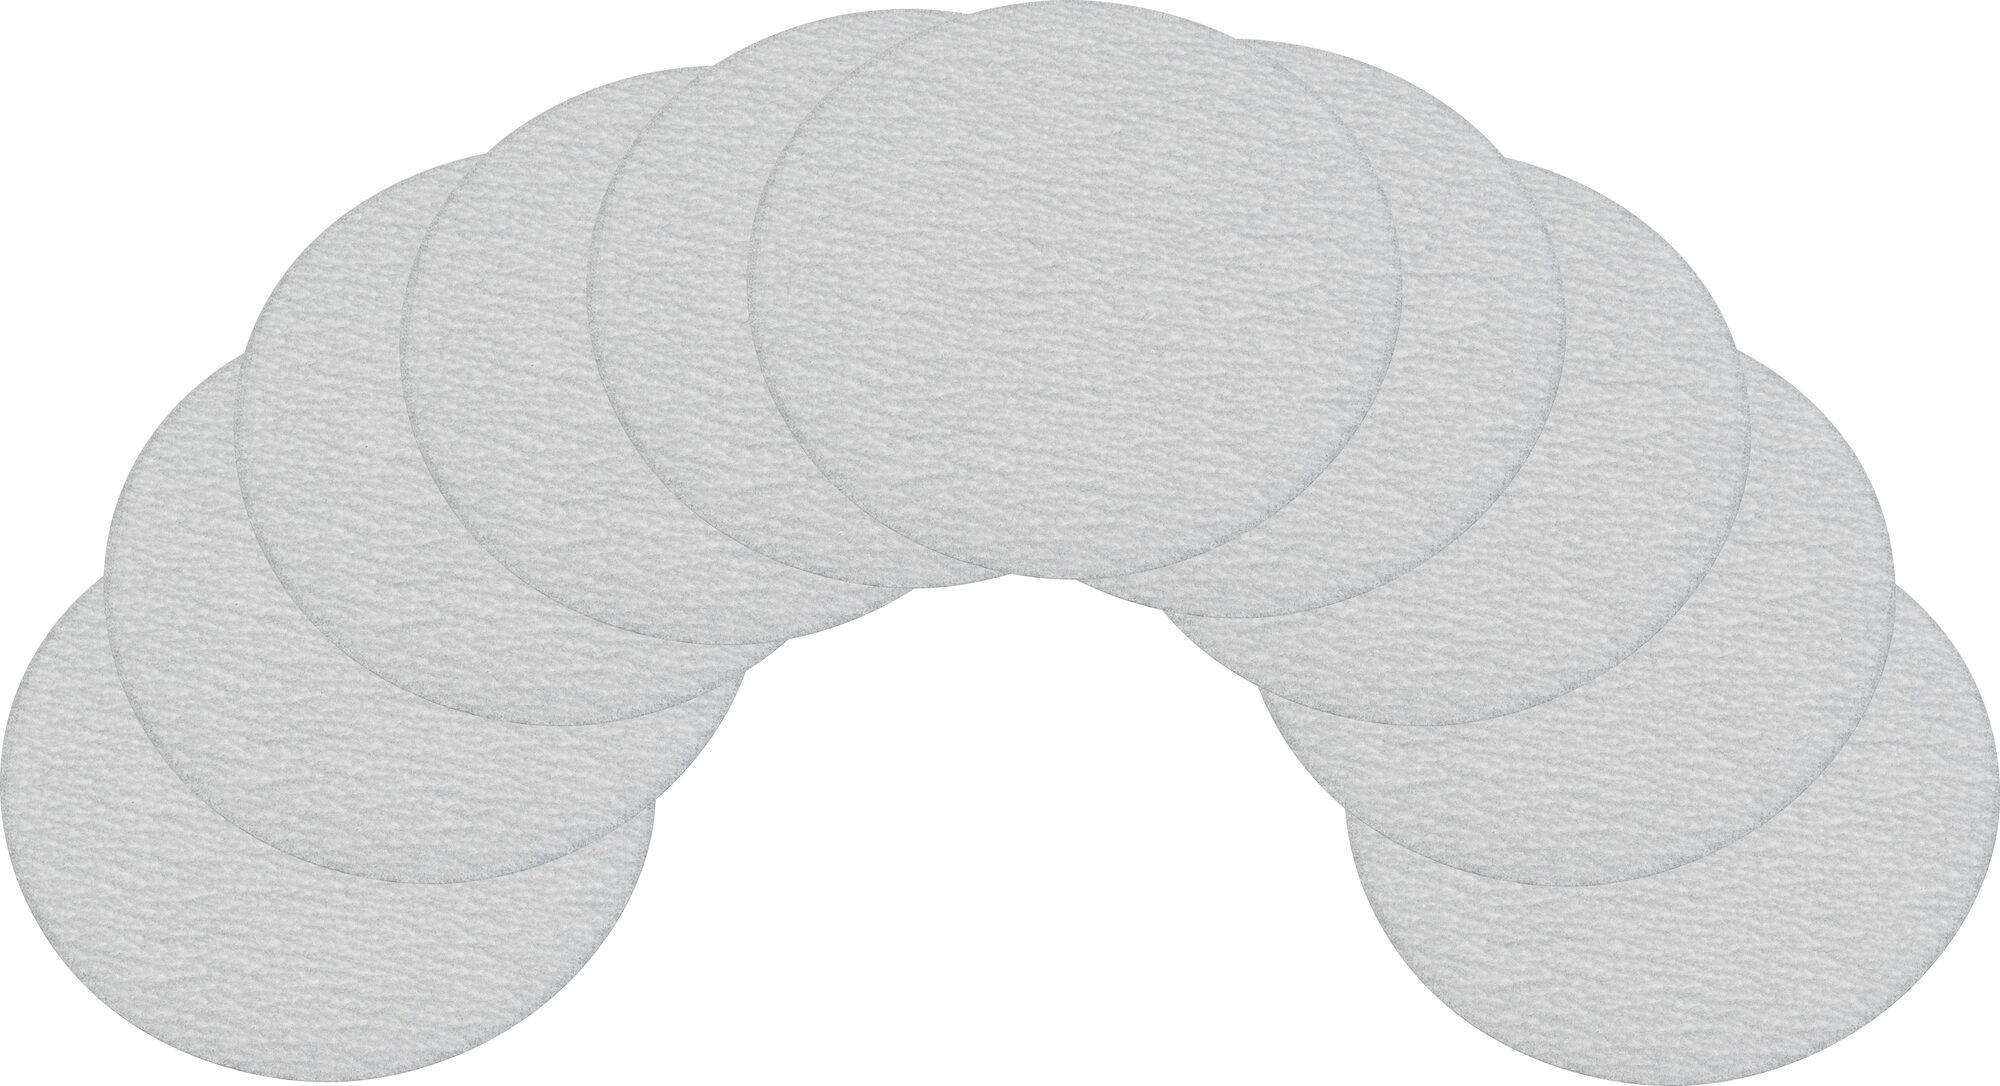 HAZET Ersatz-Schleifpads ∙ Körnung 320 ∙ ⌀ 76,2mm 9033-5-04/10